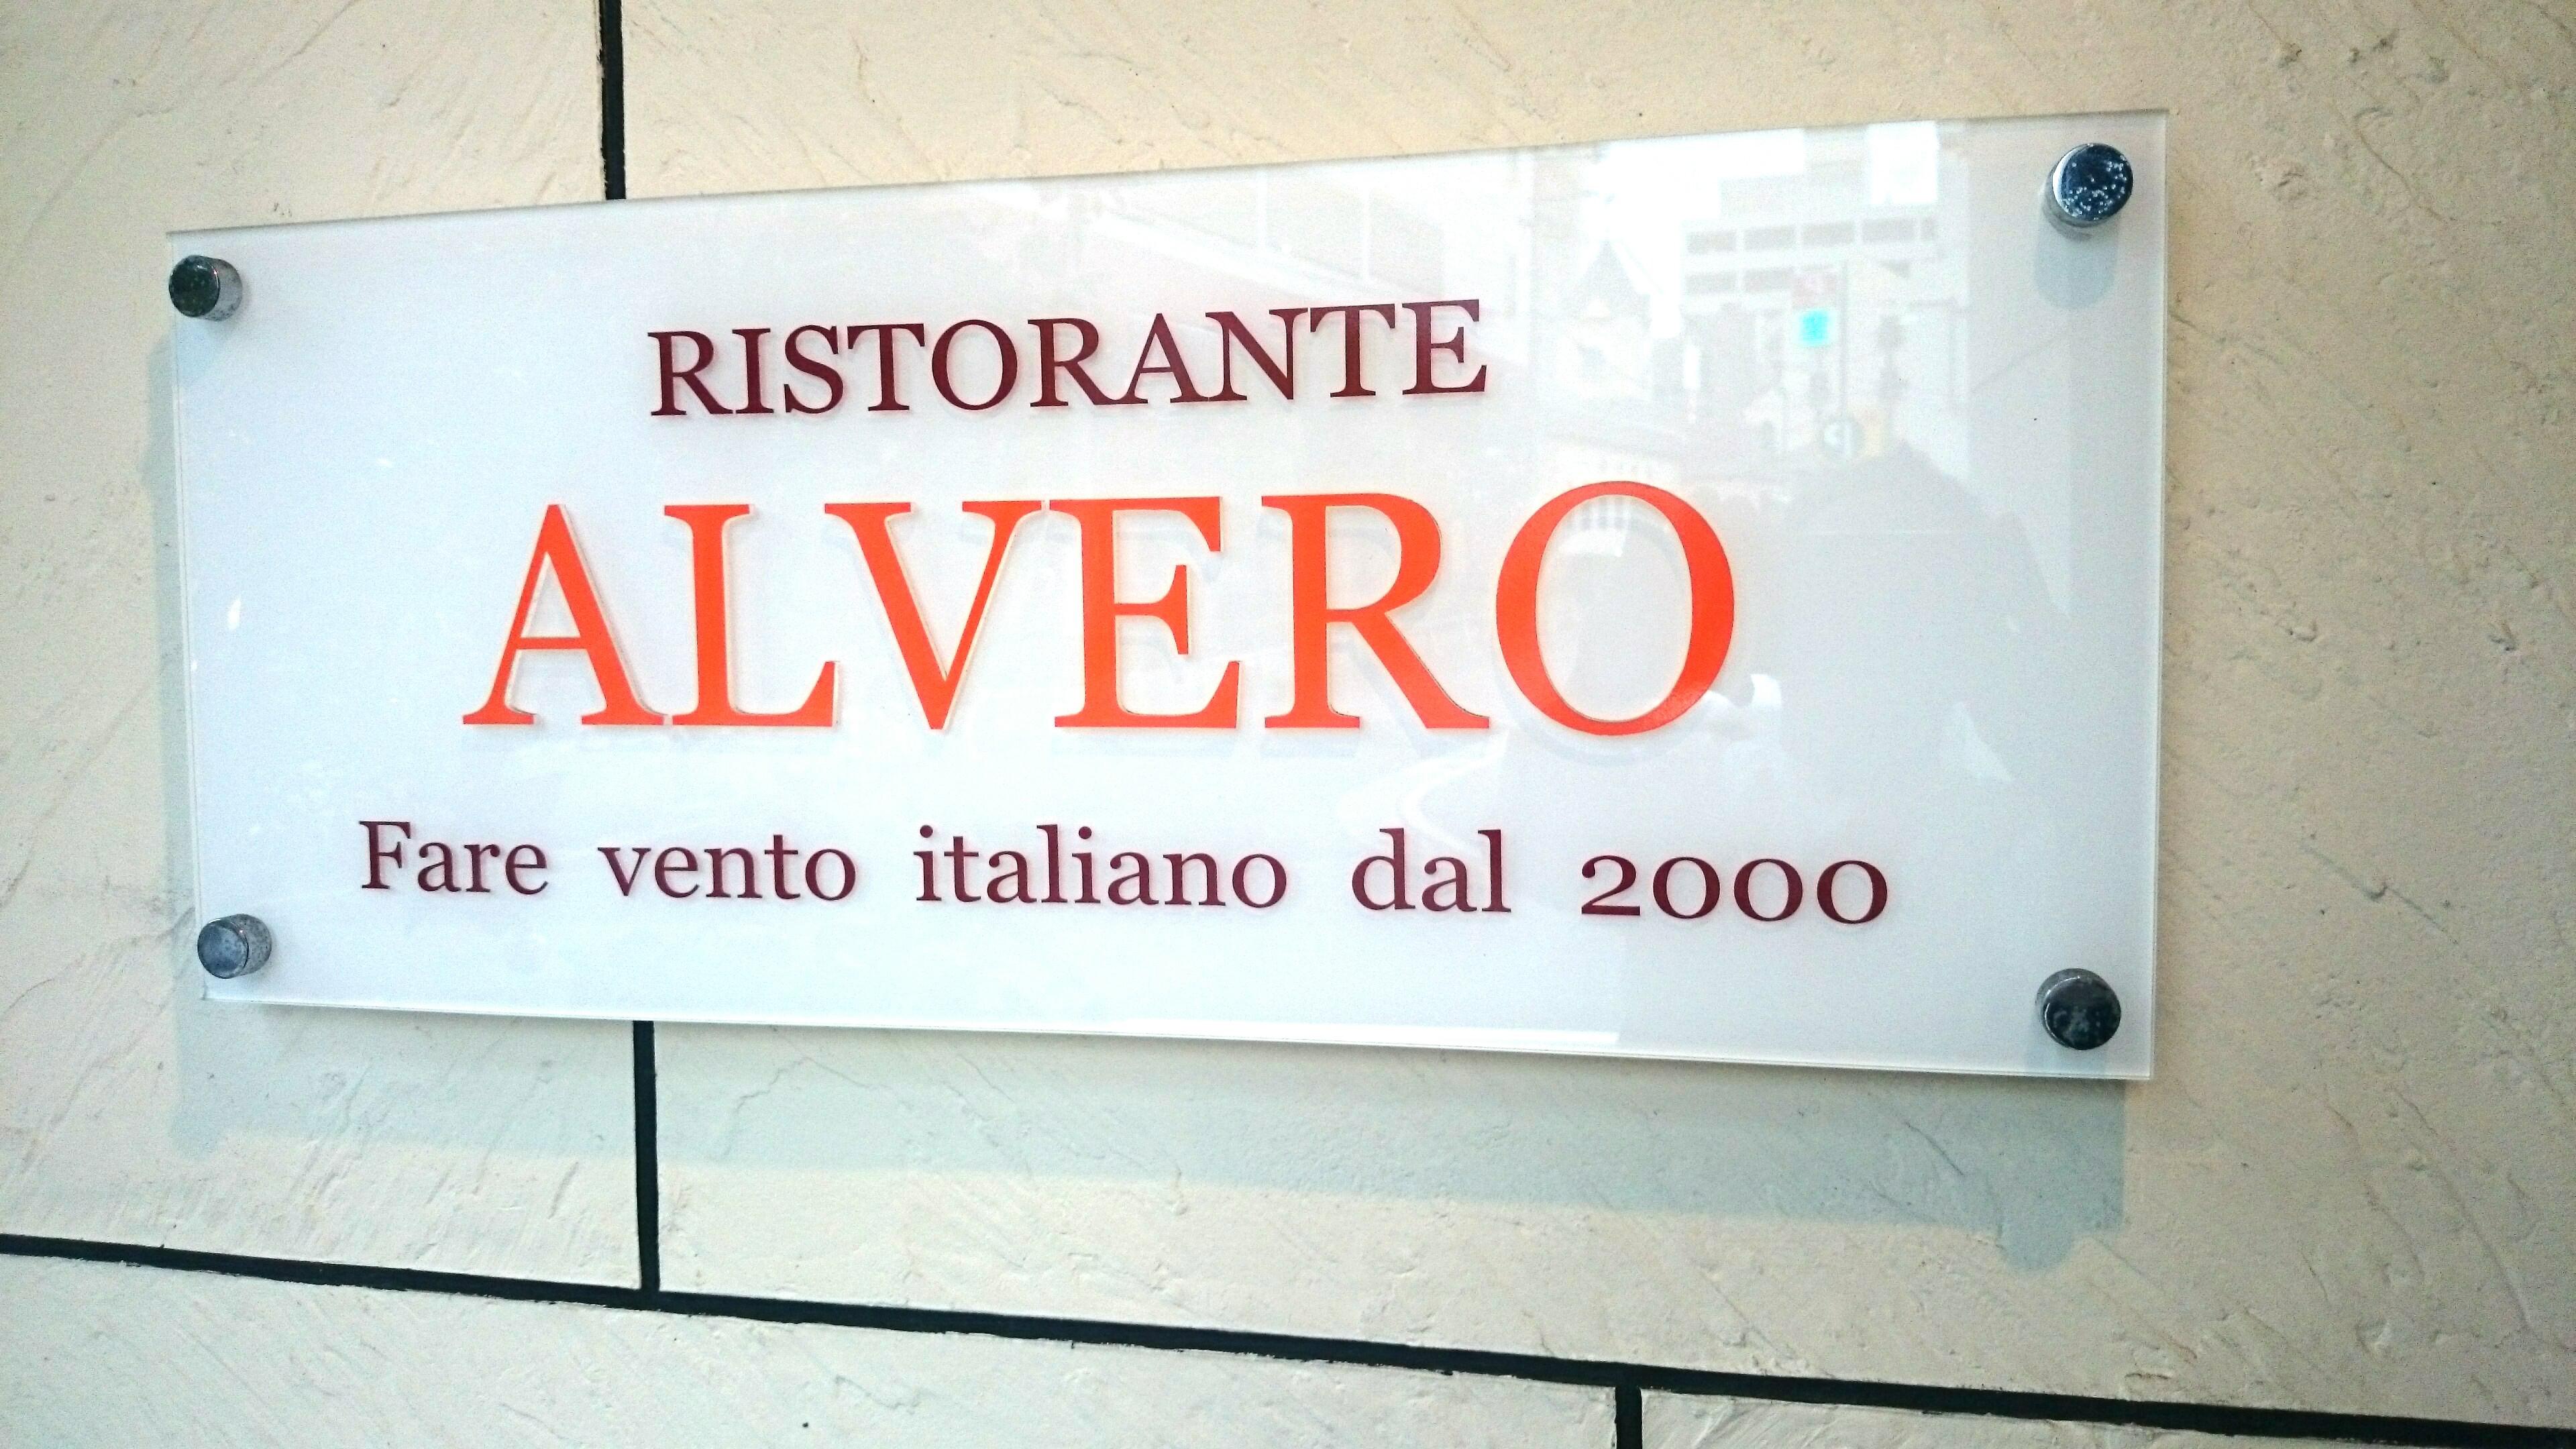 alvero restaurant logo